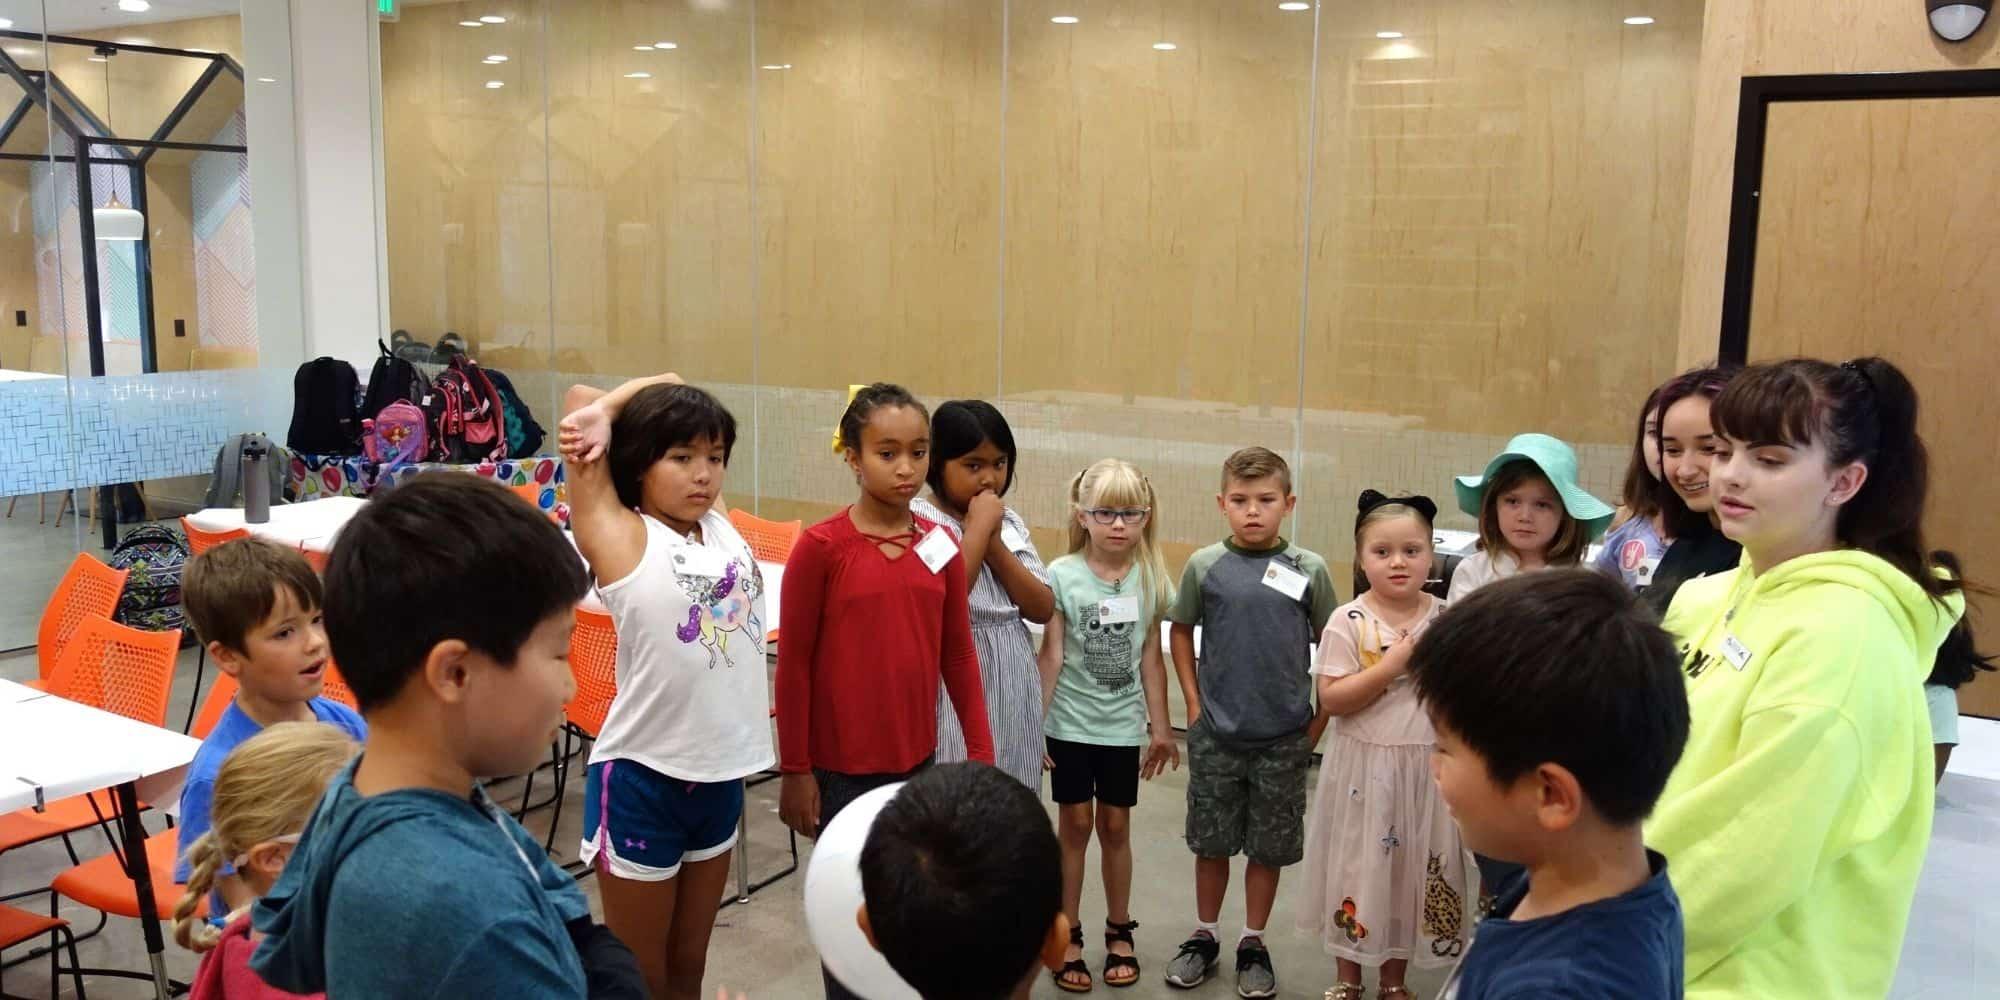 Summer camp for boys and girls Pleasanton California